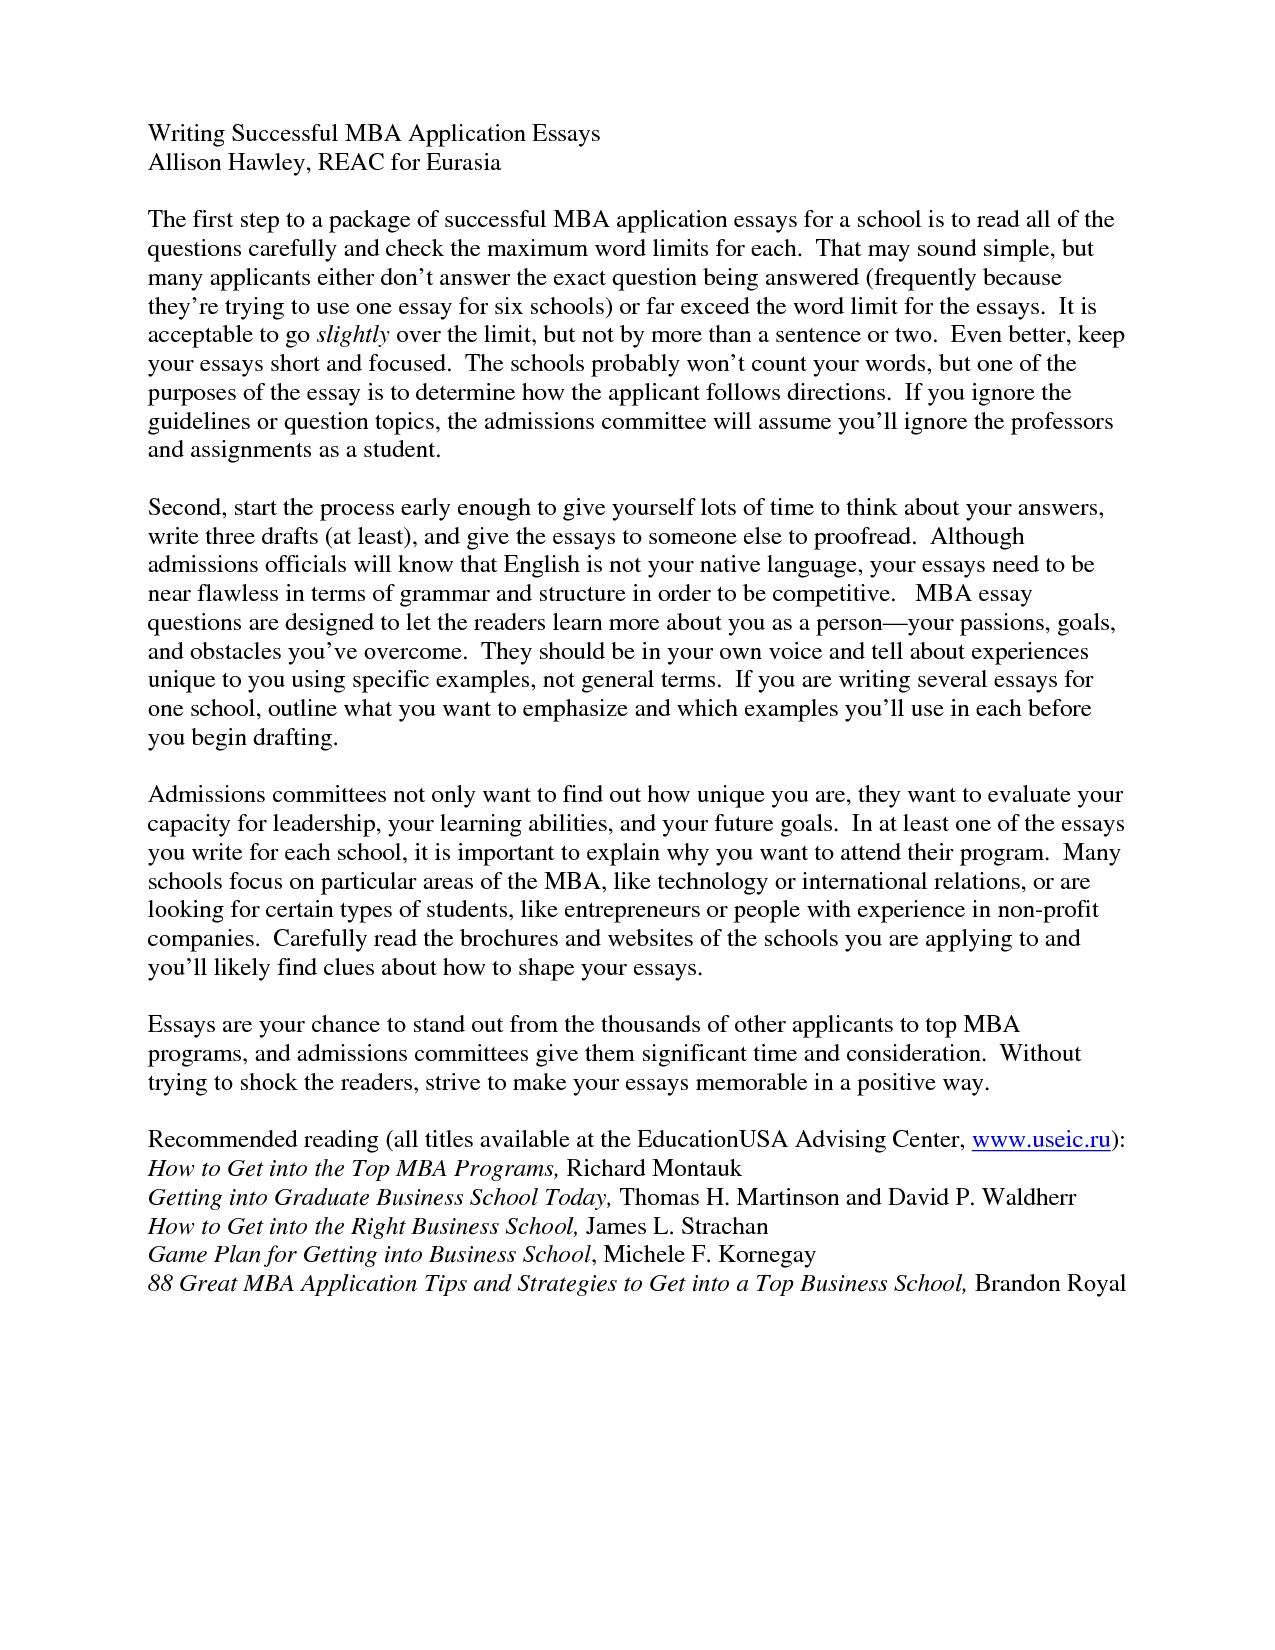 001 E9jczf4ttc Essay Example Harvard Formidable Mba Length Question 2018 Sample Full